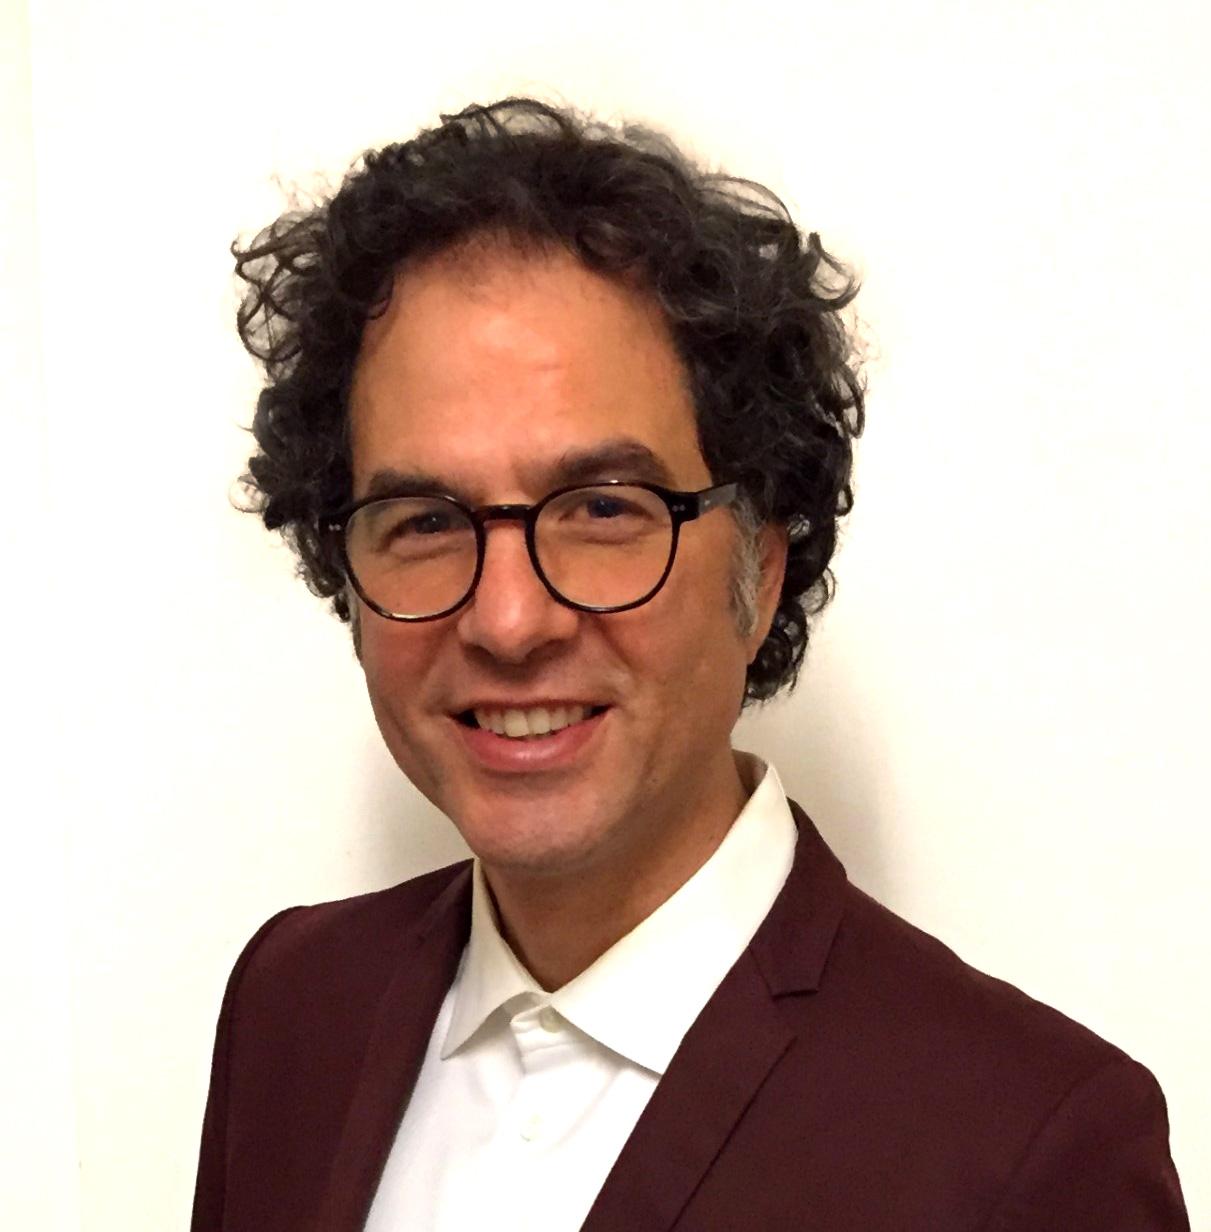 Clinical Psychologist Melbourne CBD: Dr Arthur Stabolidis